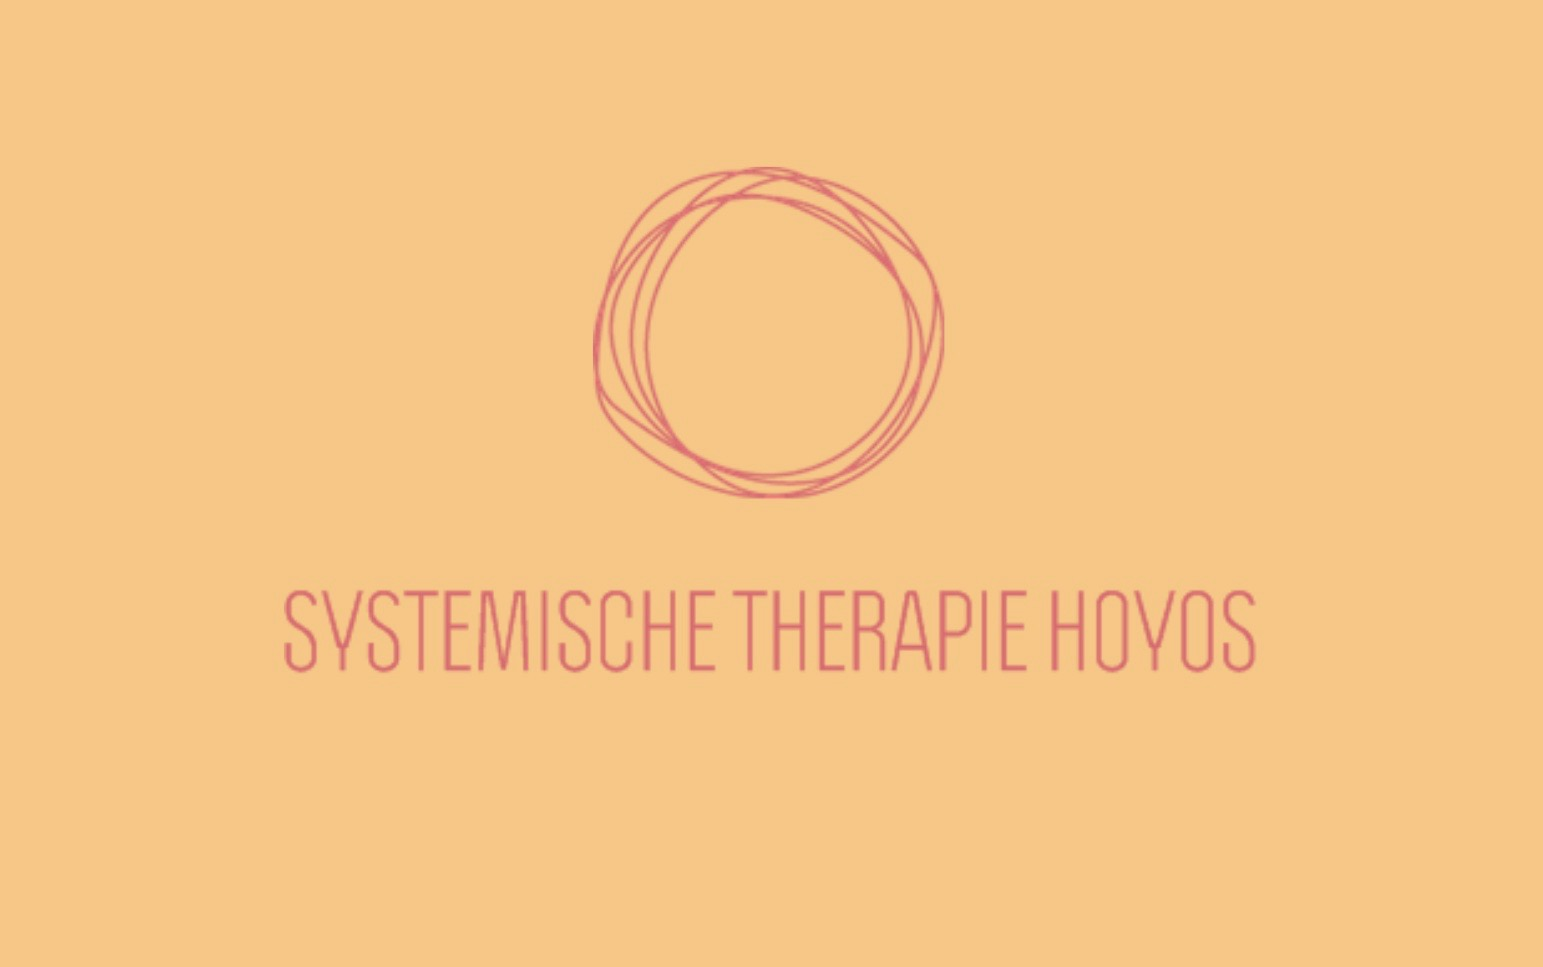 Systemische Therapie Hoyos